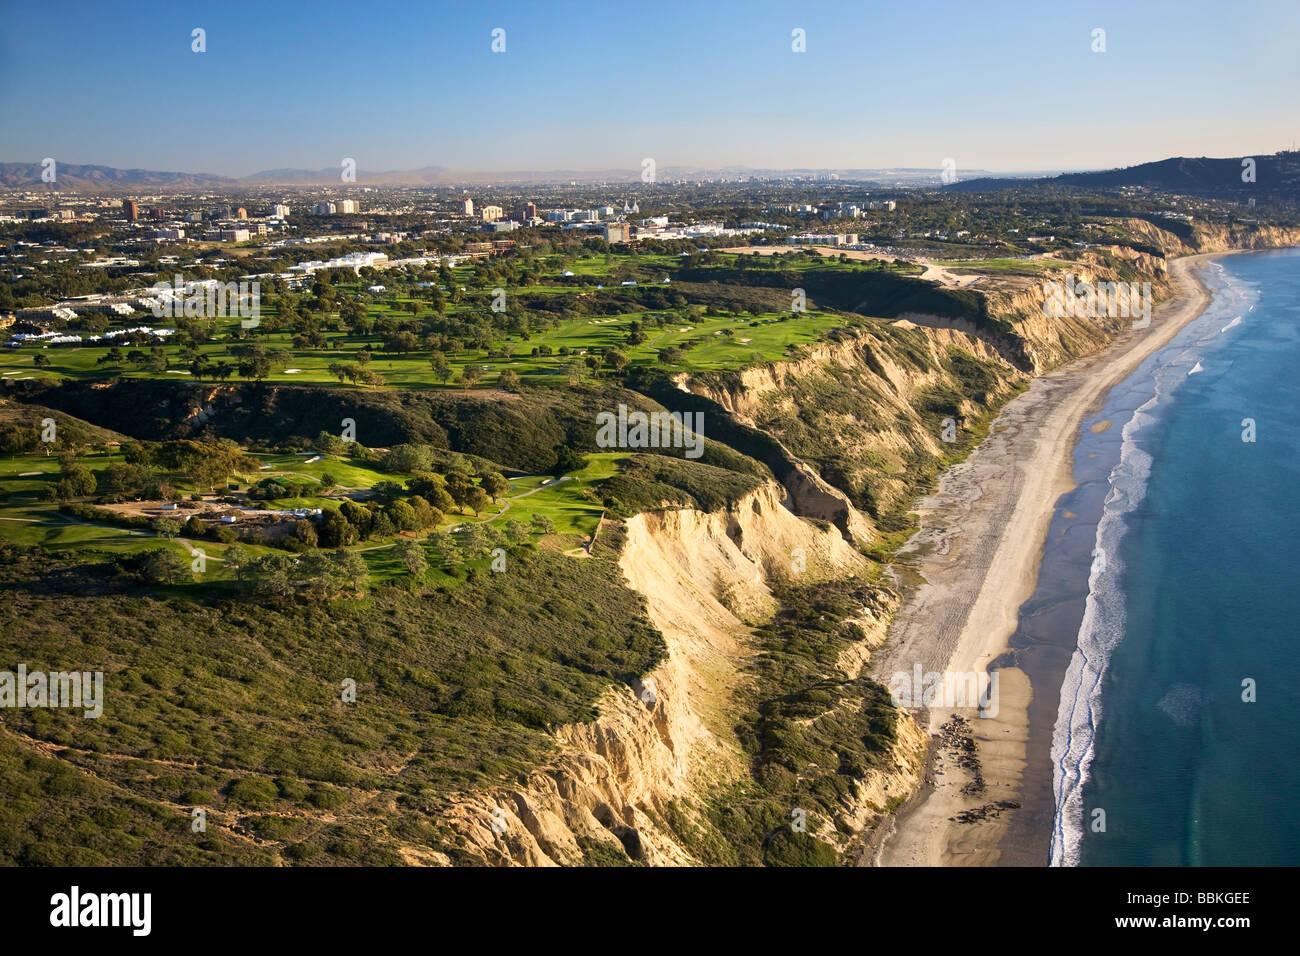 Torrey Pines Golf Course San Diego County La Jolla California - Stock Image